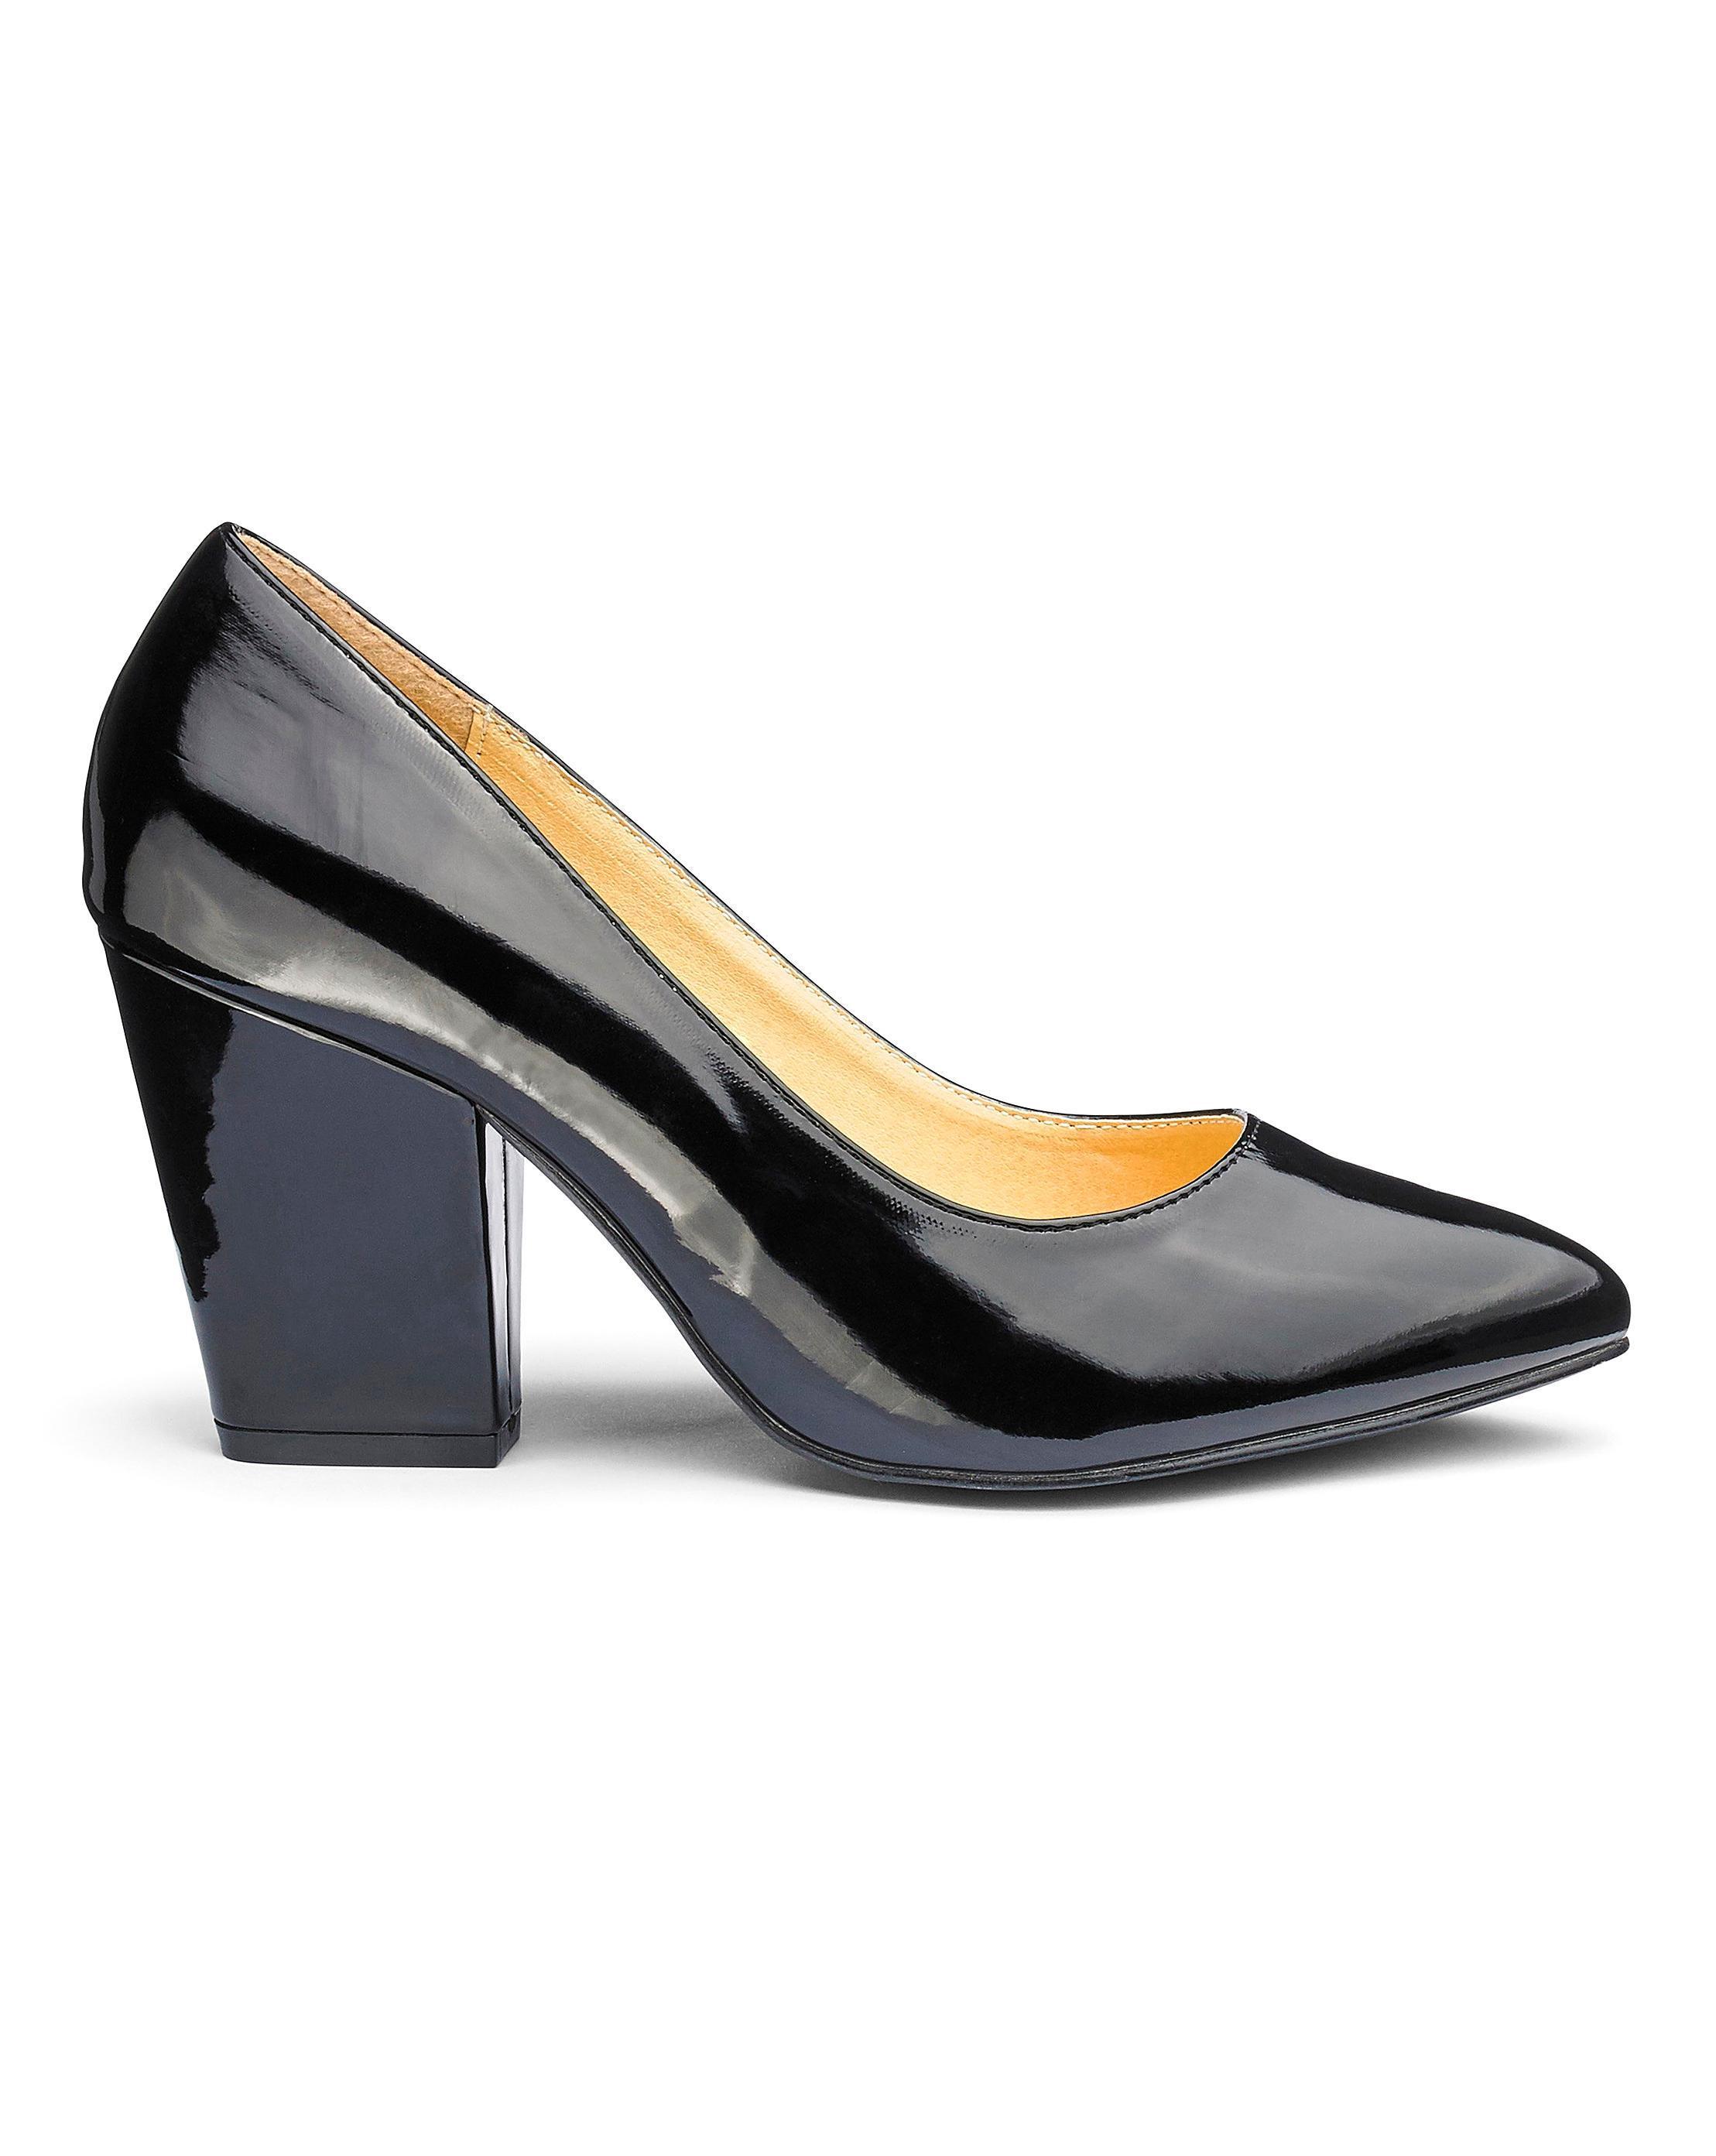 56e65aa29d3 Lyst - Simply Be Block Heel Pumps in Black